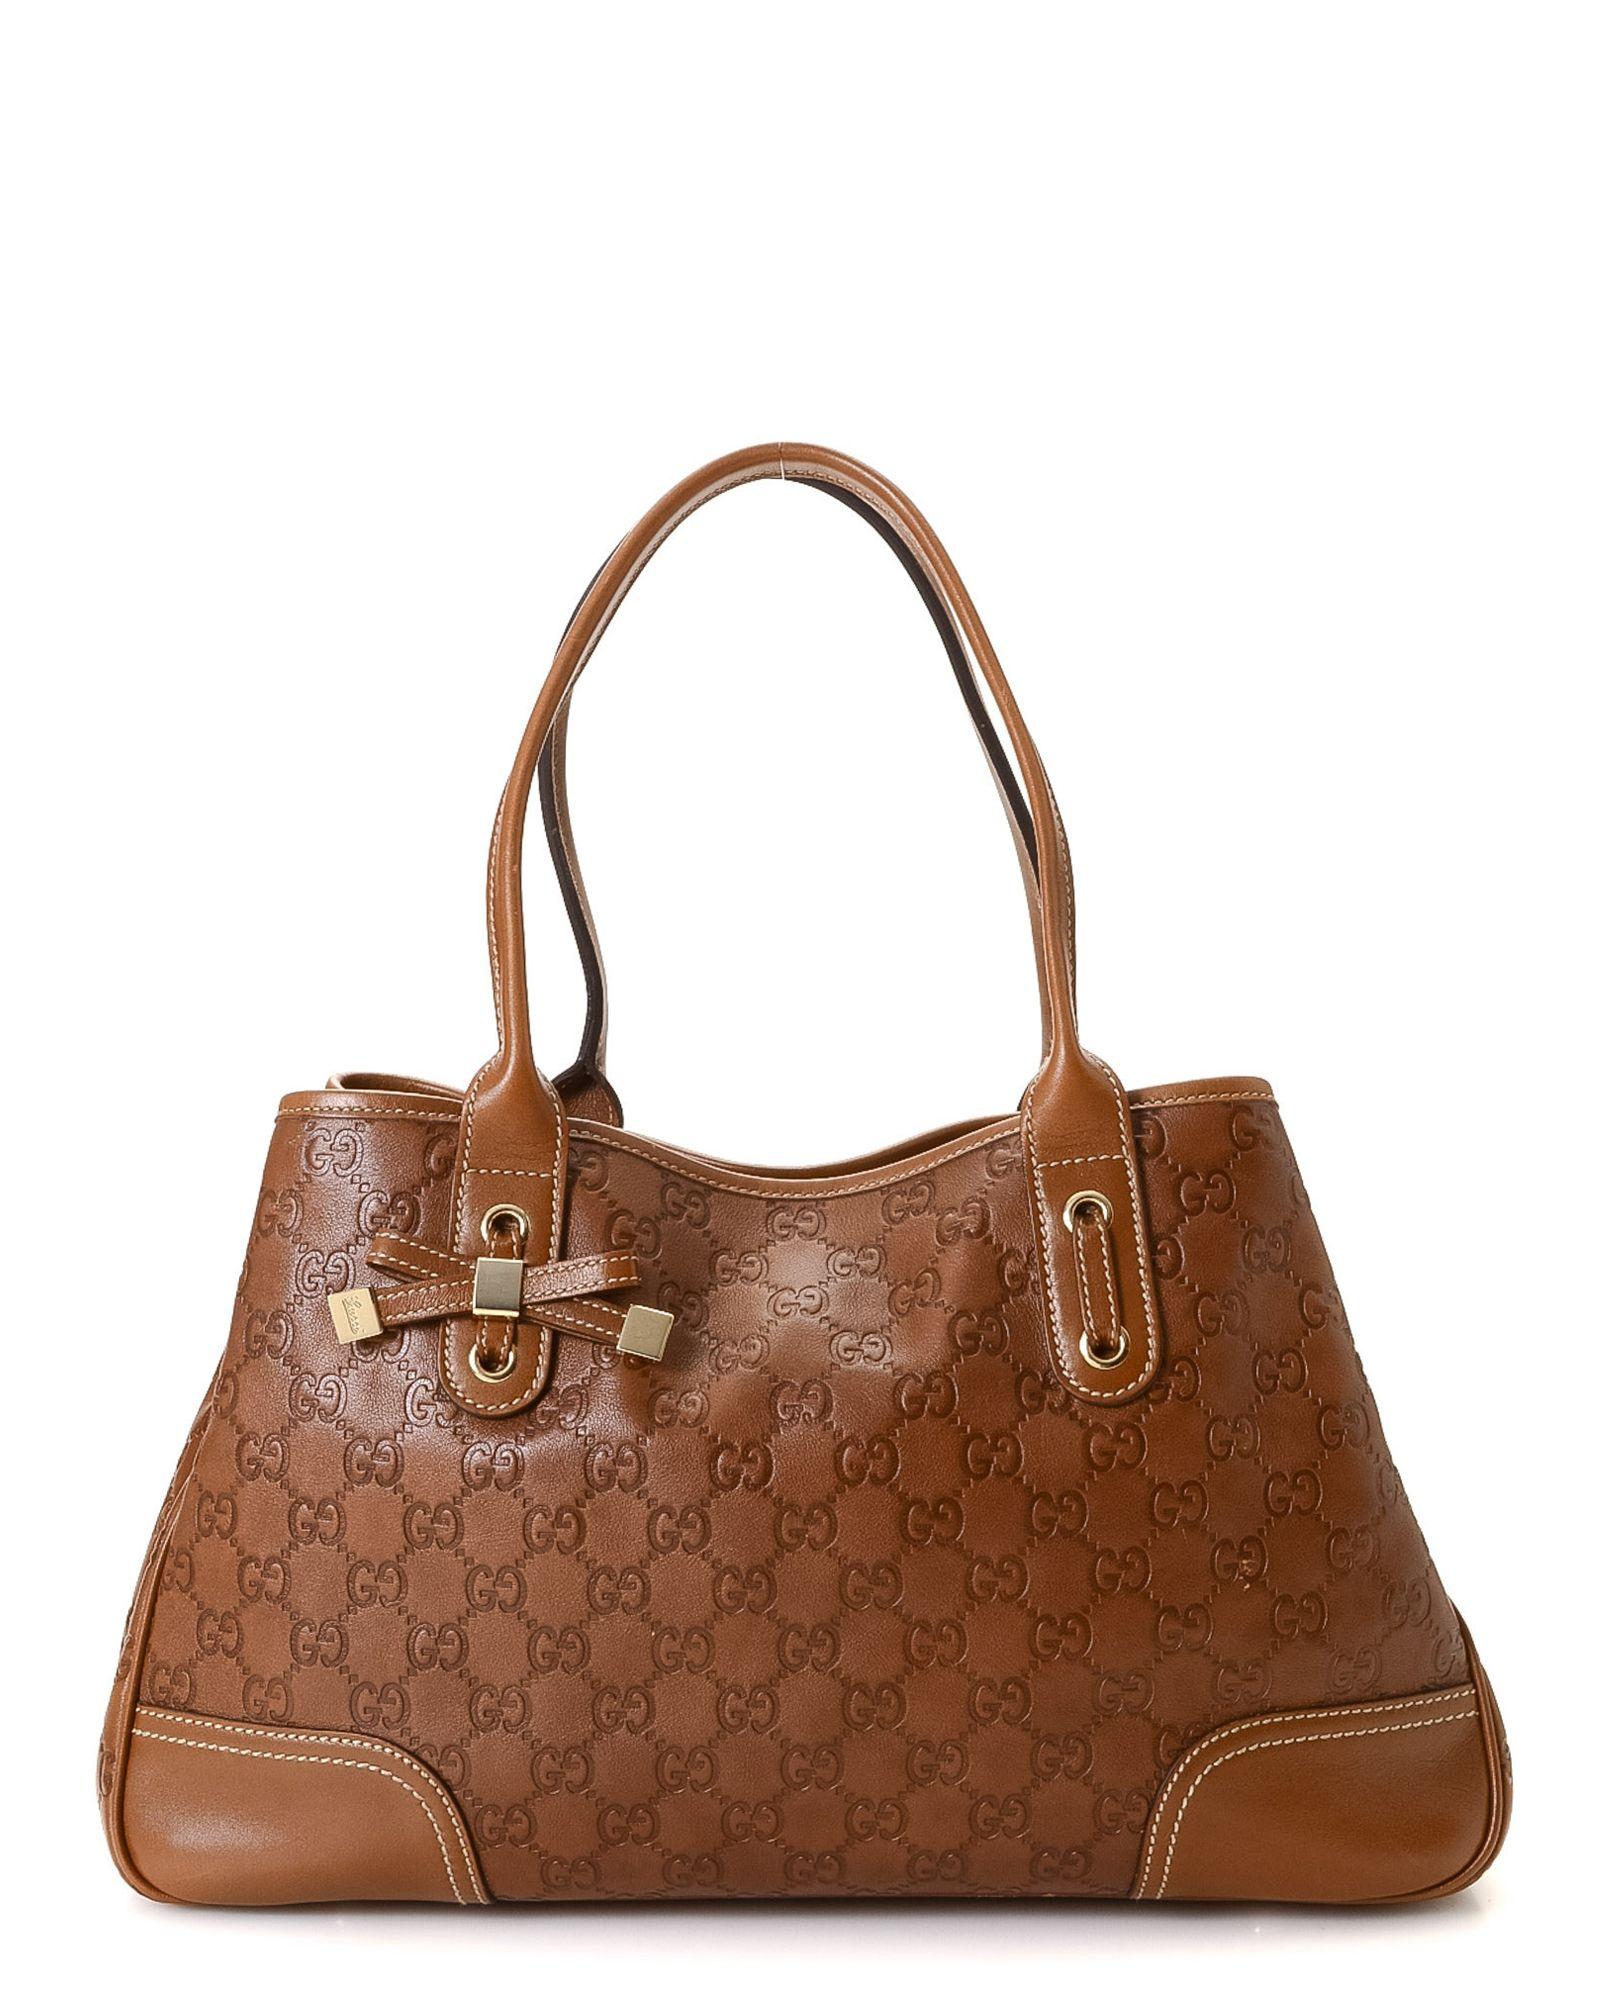 c47ca9f3e2248c Gucci Guccissima Princy Shoulder Bag - Vintage | *Century 21 Stores ...